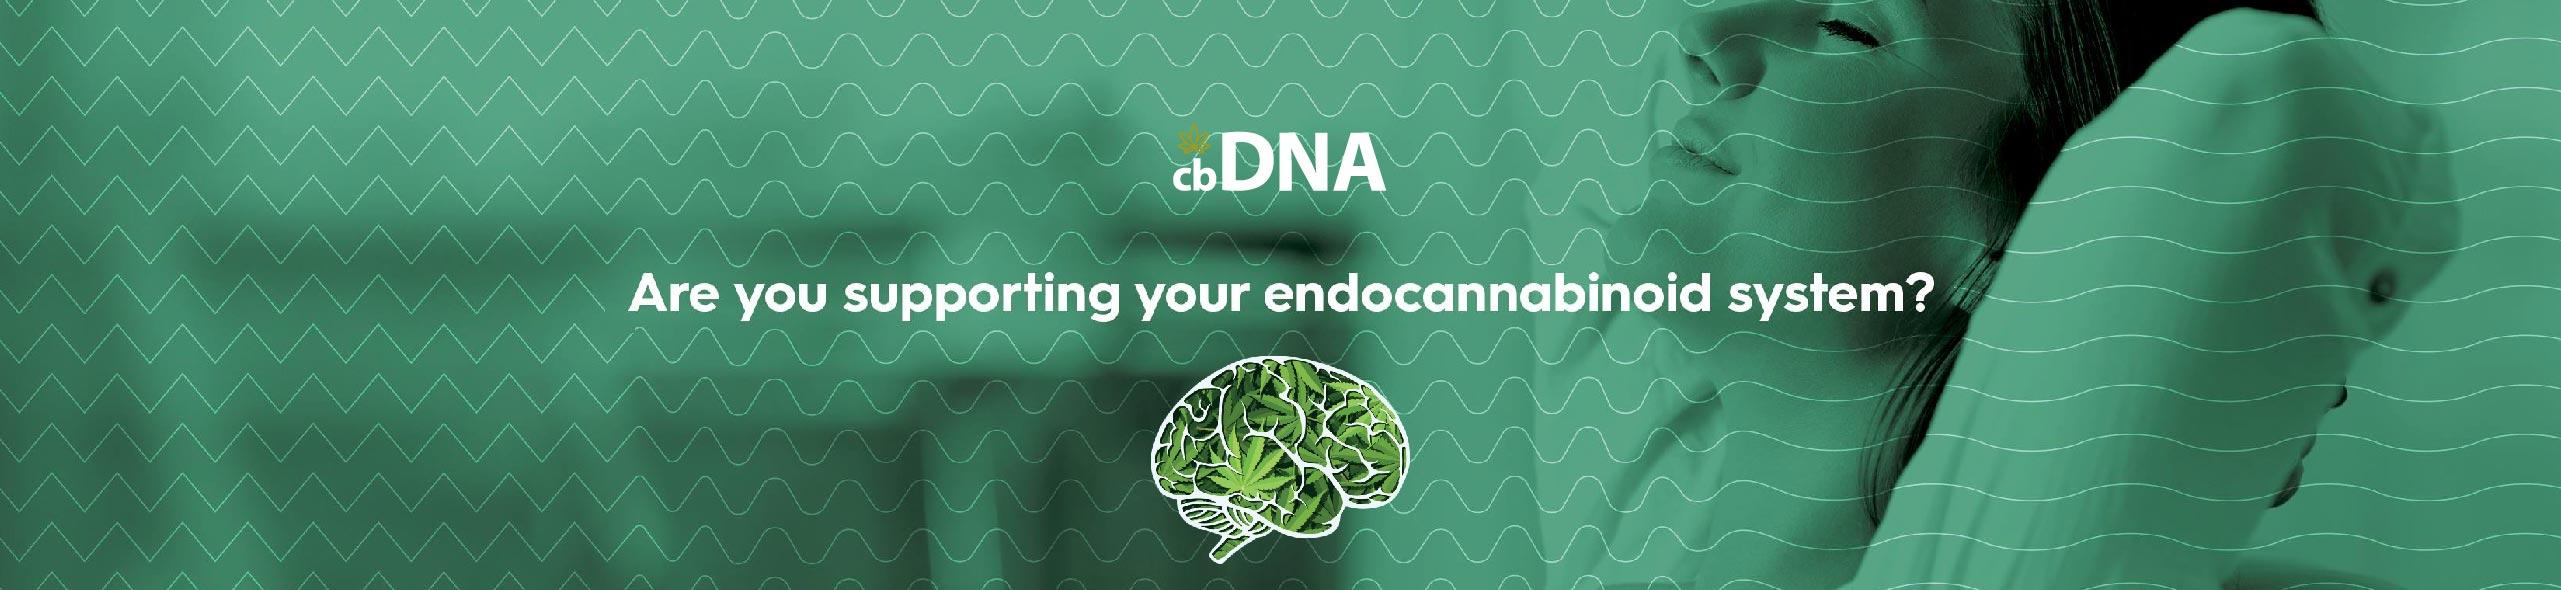 cbDNA CBD Endocannabinoid System 01